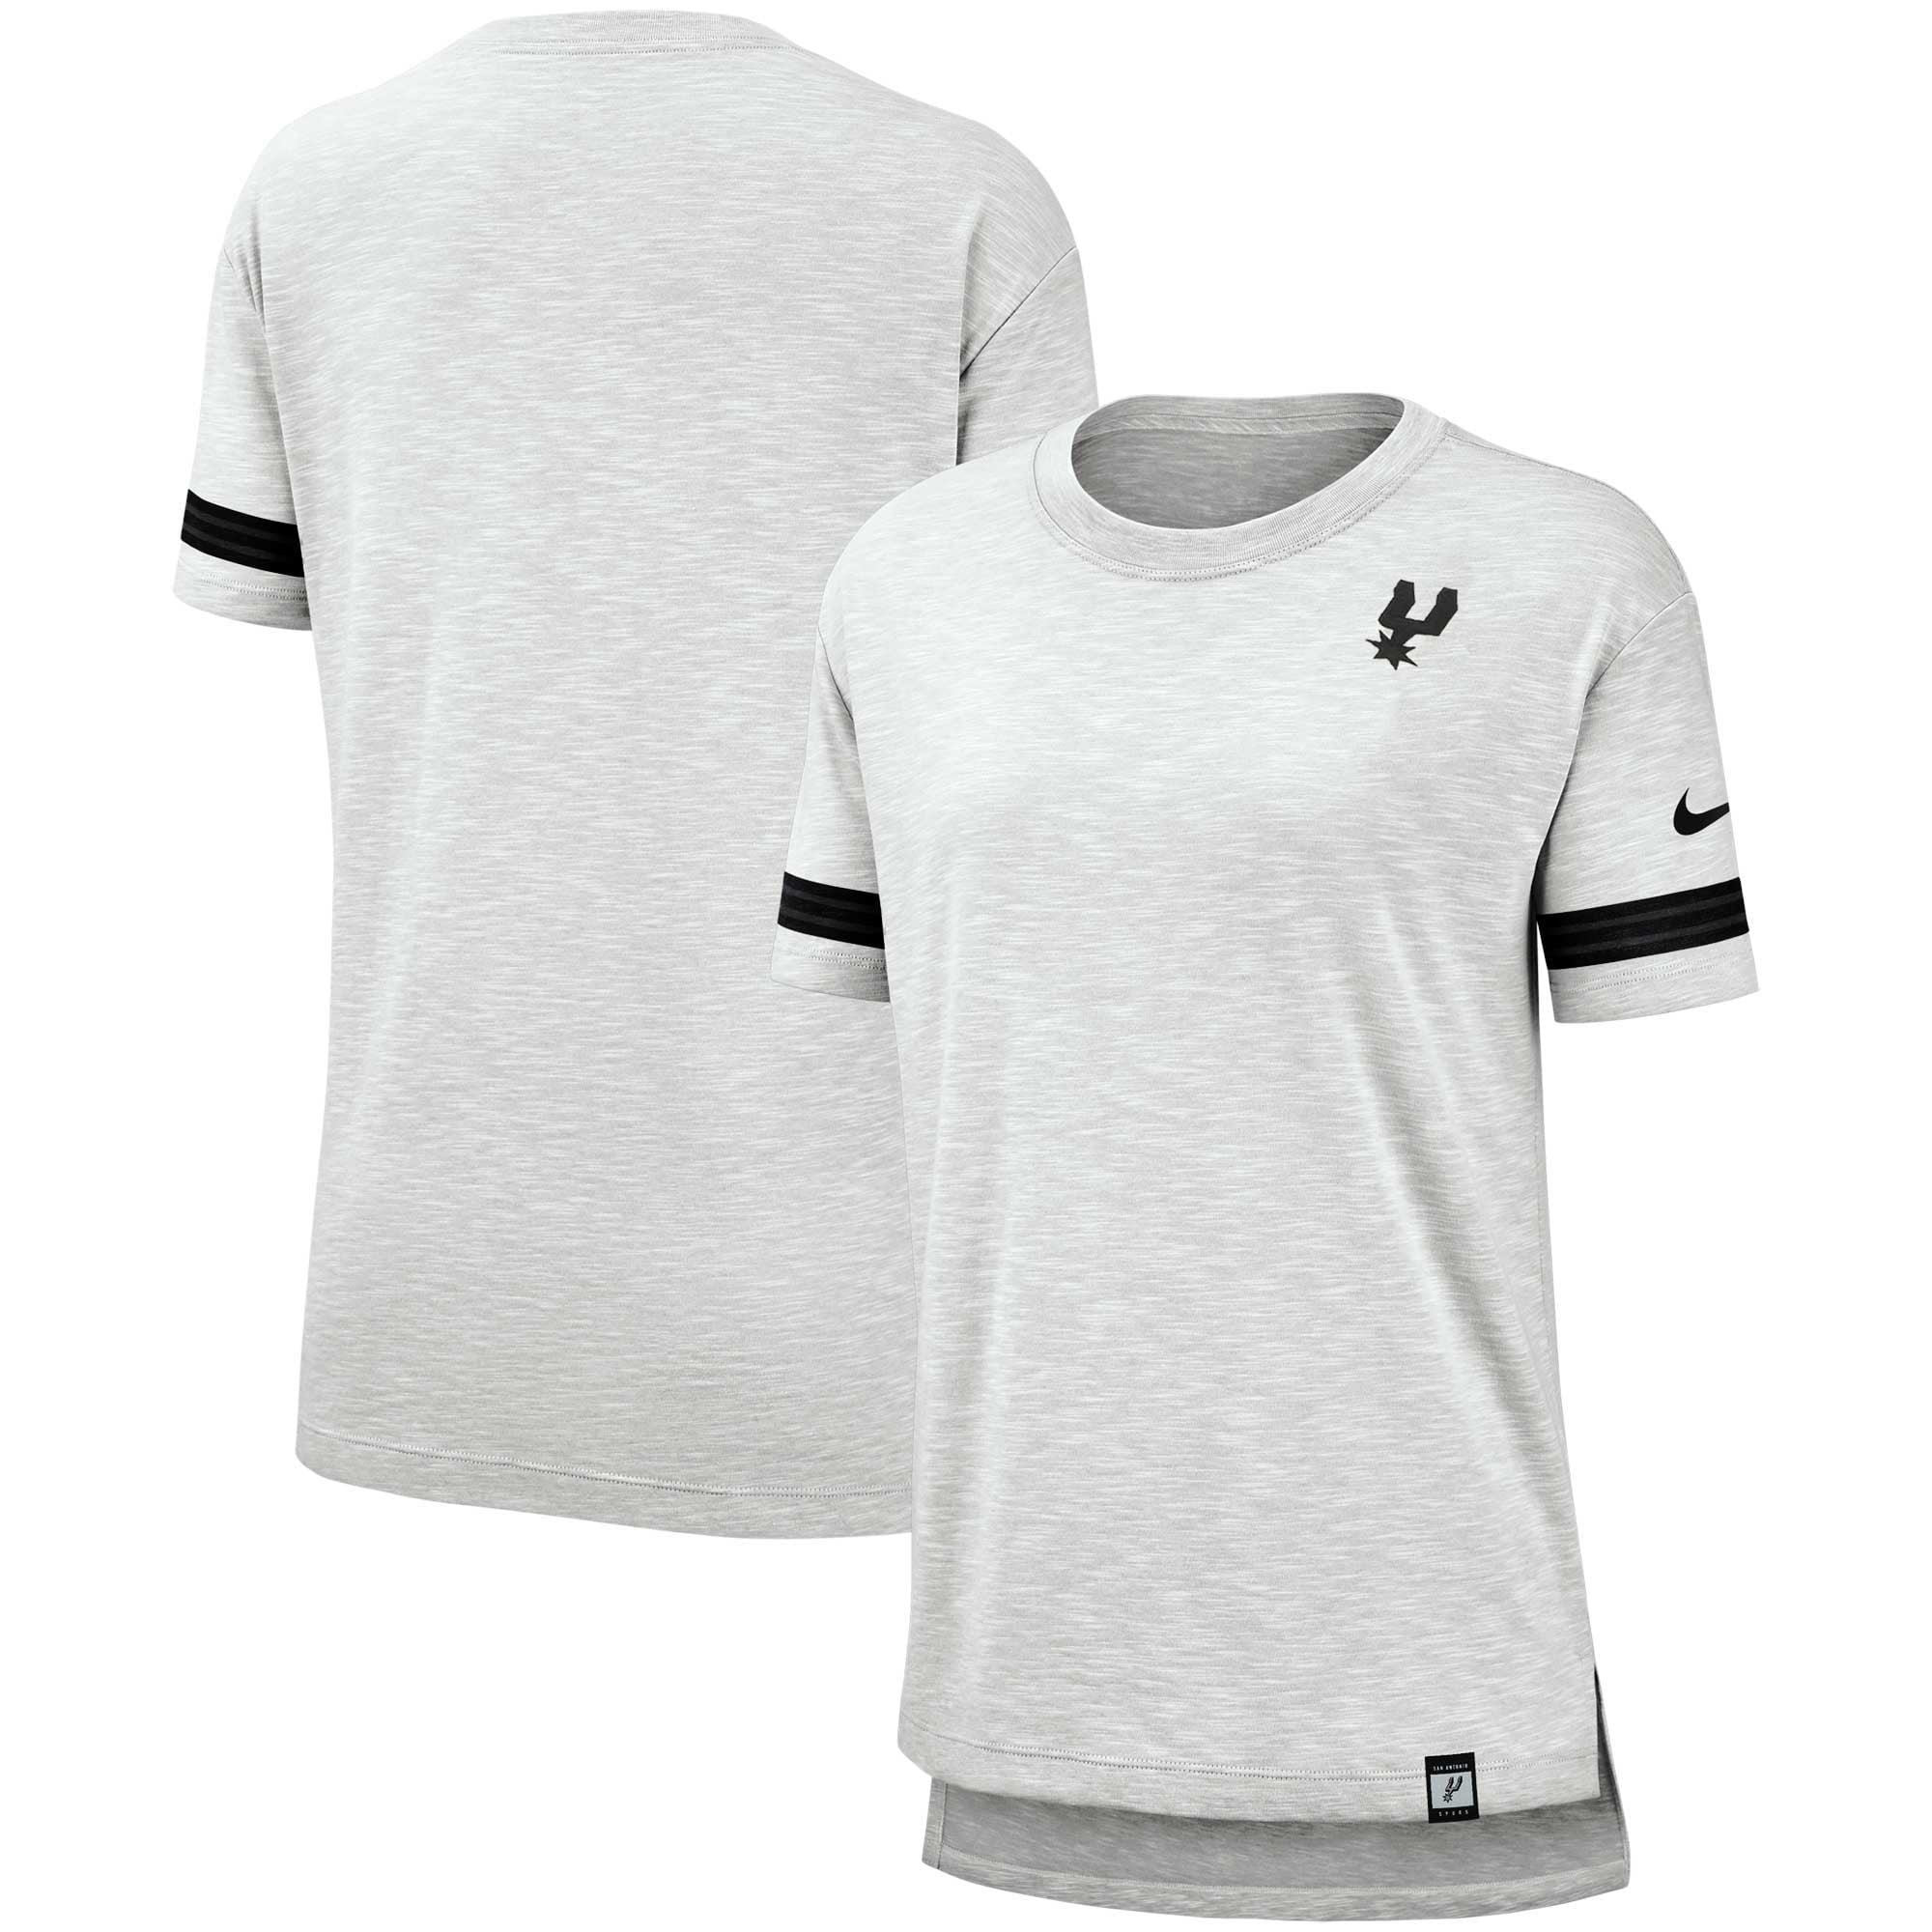 San Antonio Spurs Nike Women's Color Rush Sleeve Stripe Slub T-Shirt - Heathered Gray